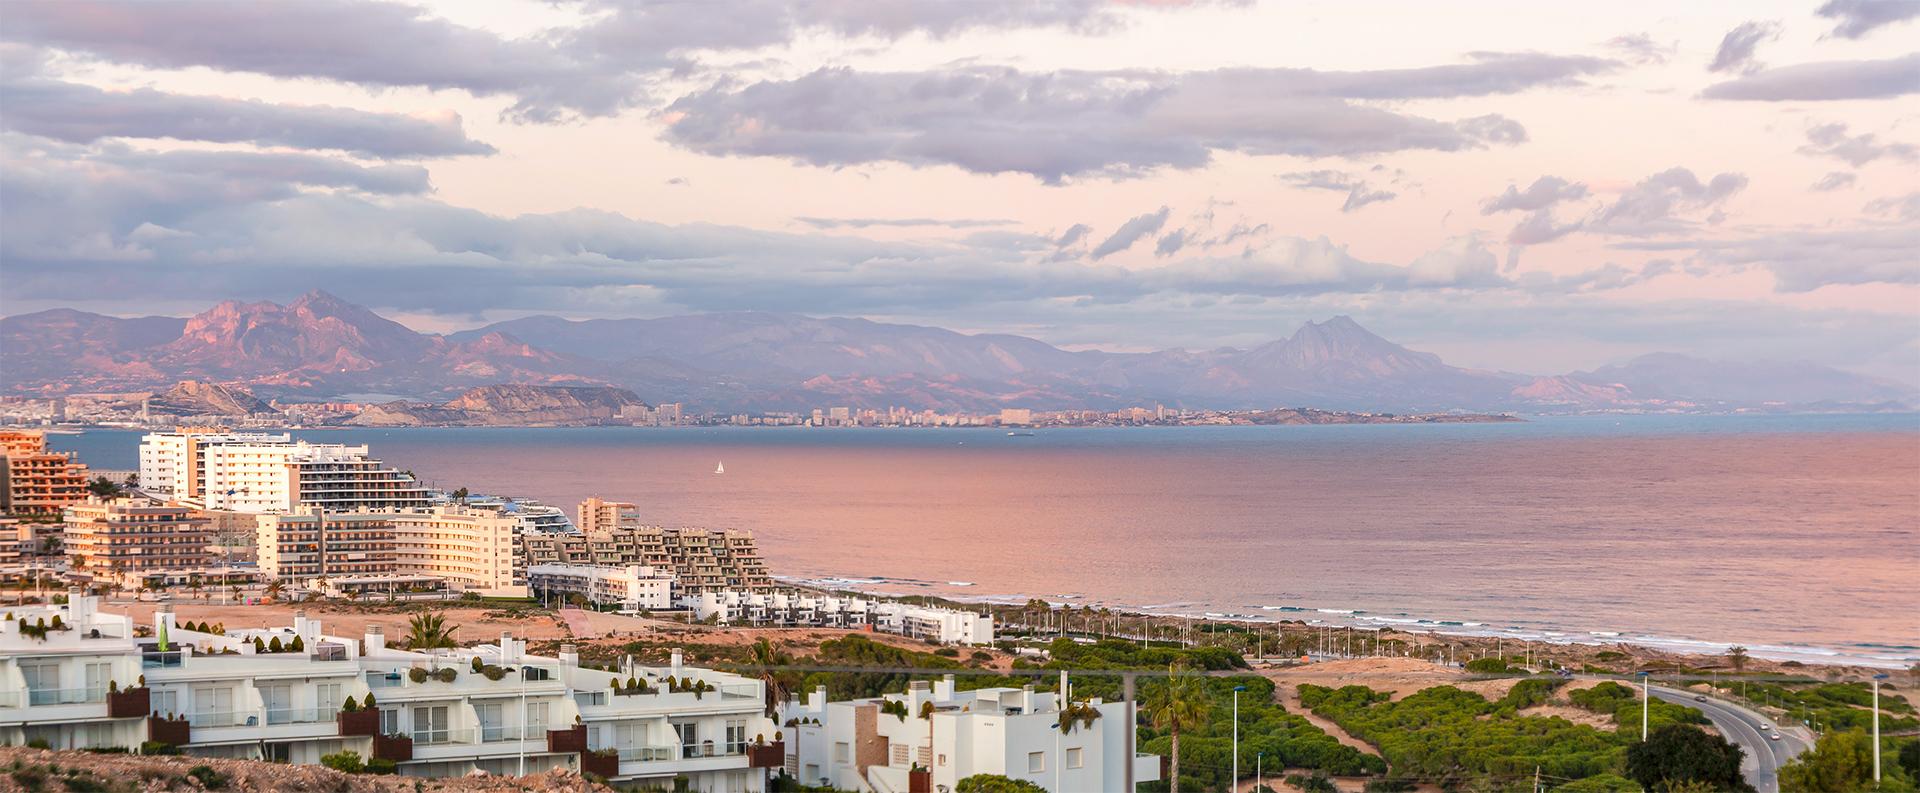 Nowe apartamenty w Gran Alacant, Costa Blanca, Hiszpania